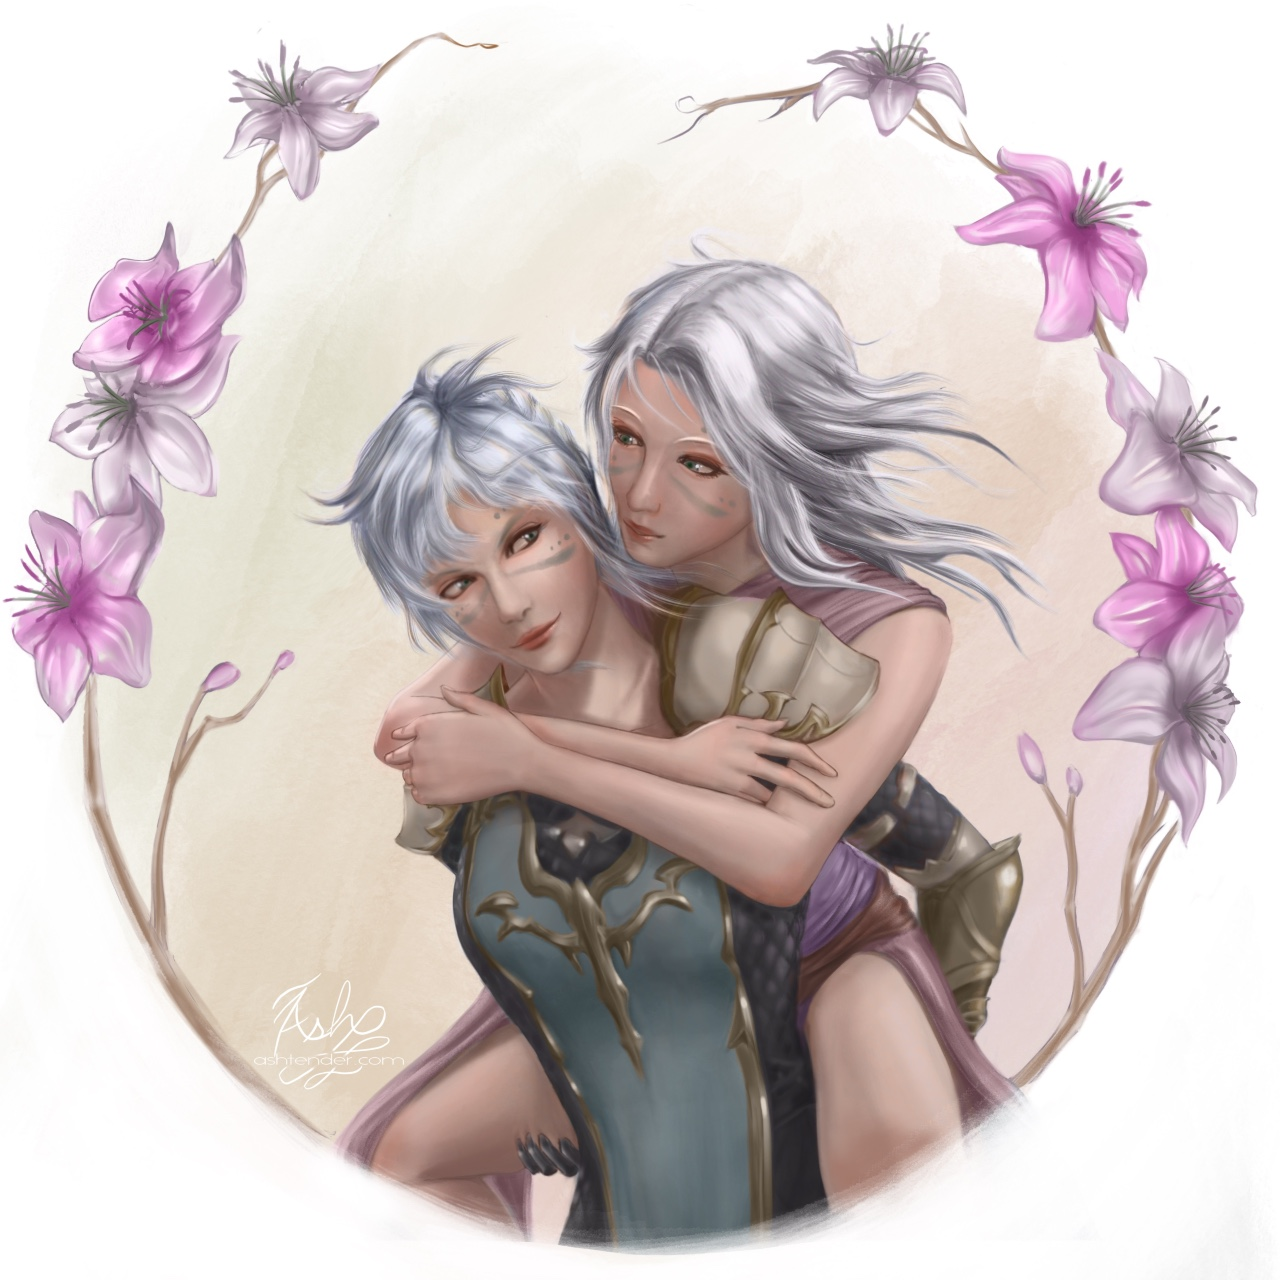 Arteka and Onyrica